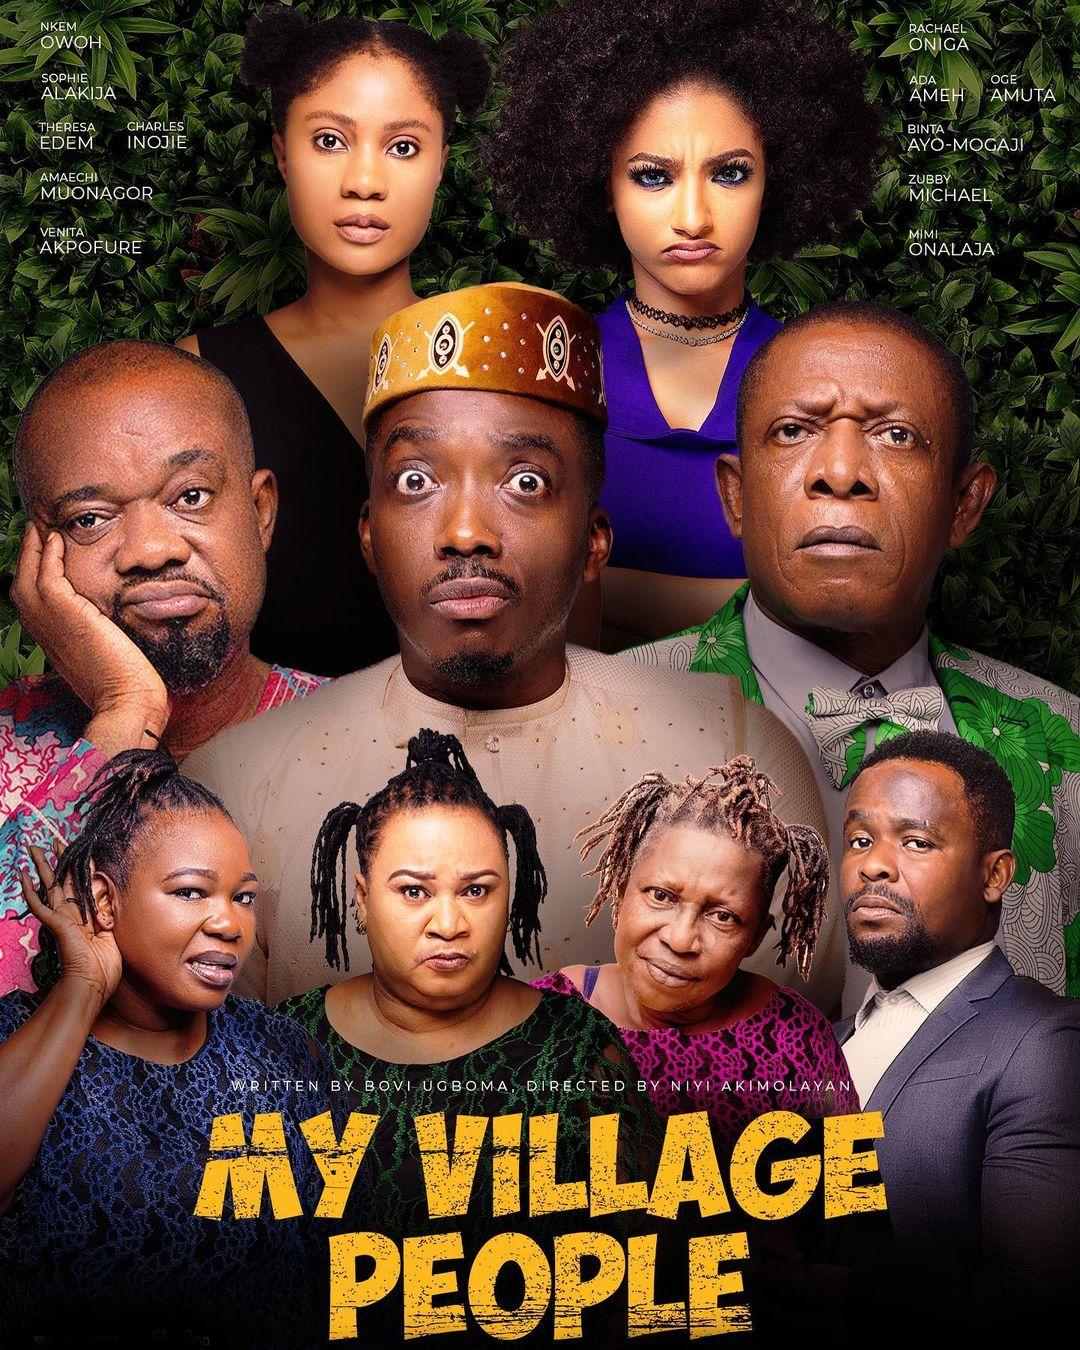 My Village People by Bovi